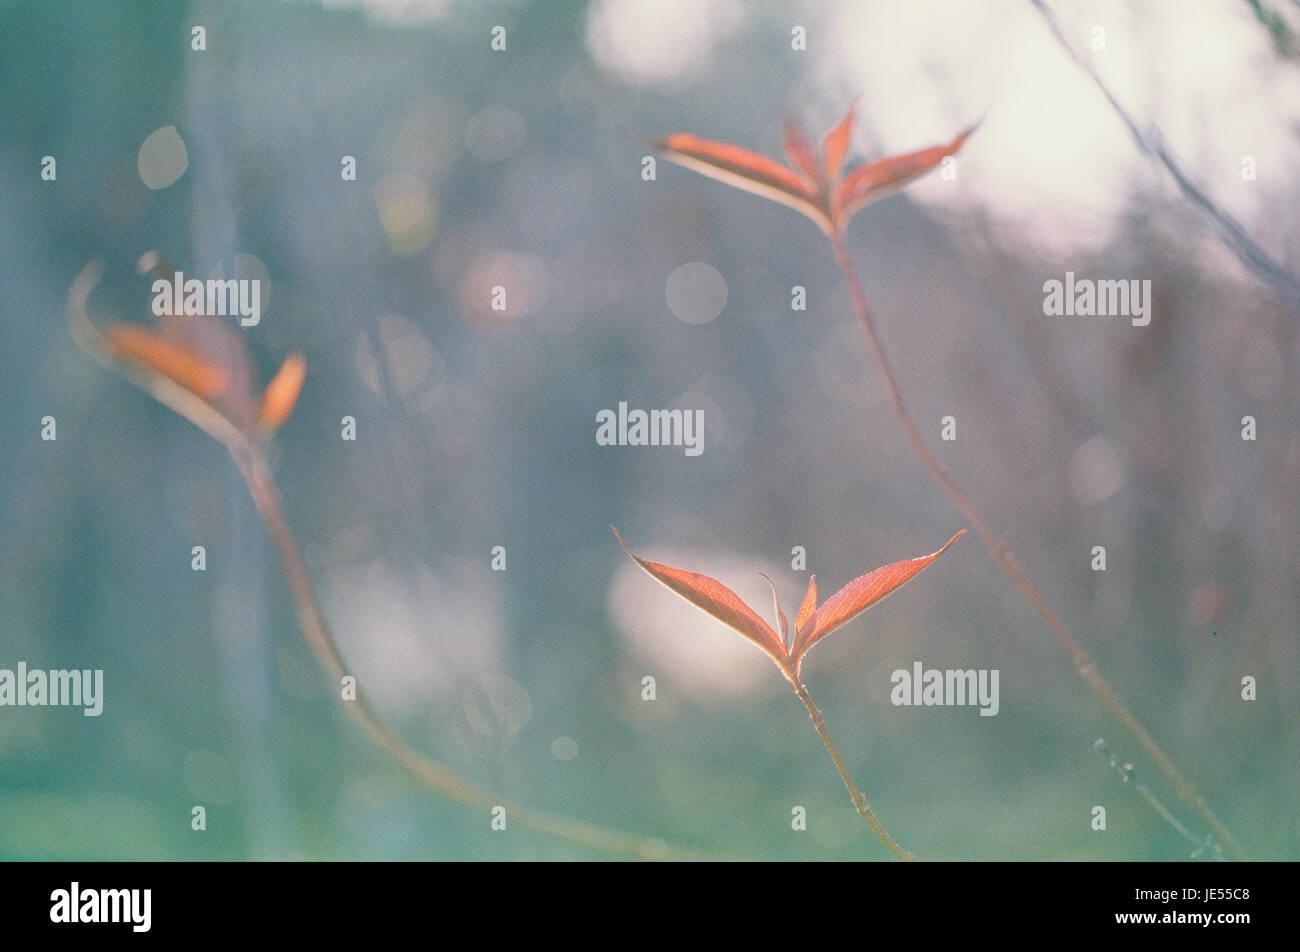 Expired film photo of autumn leaves - Stock Image